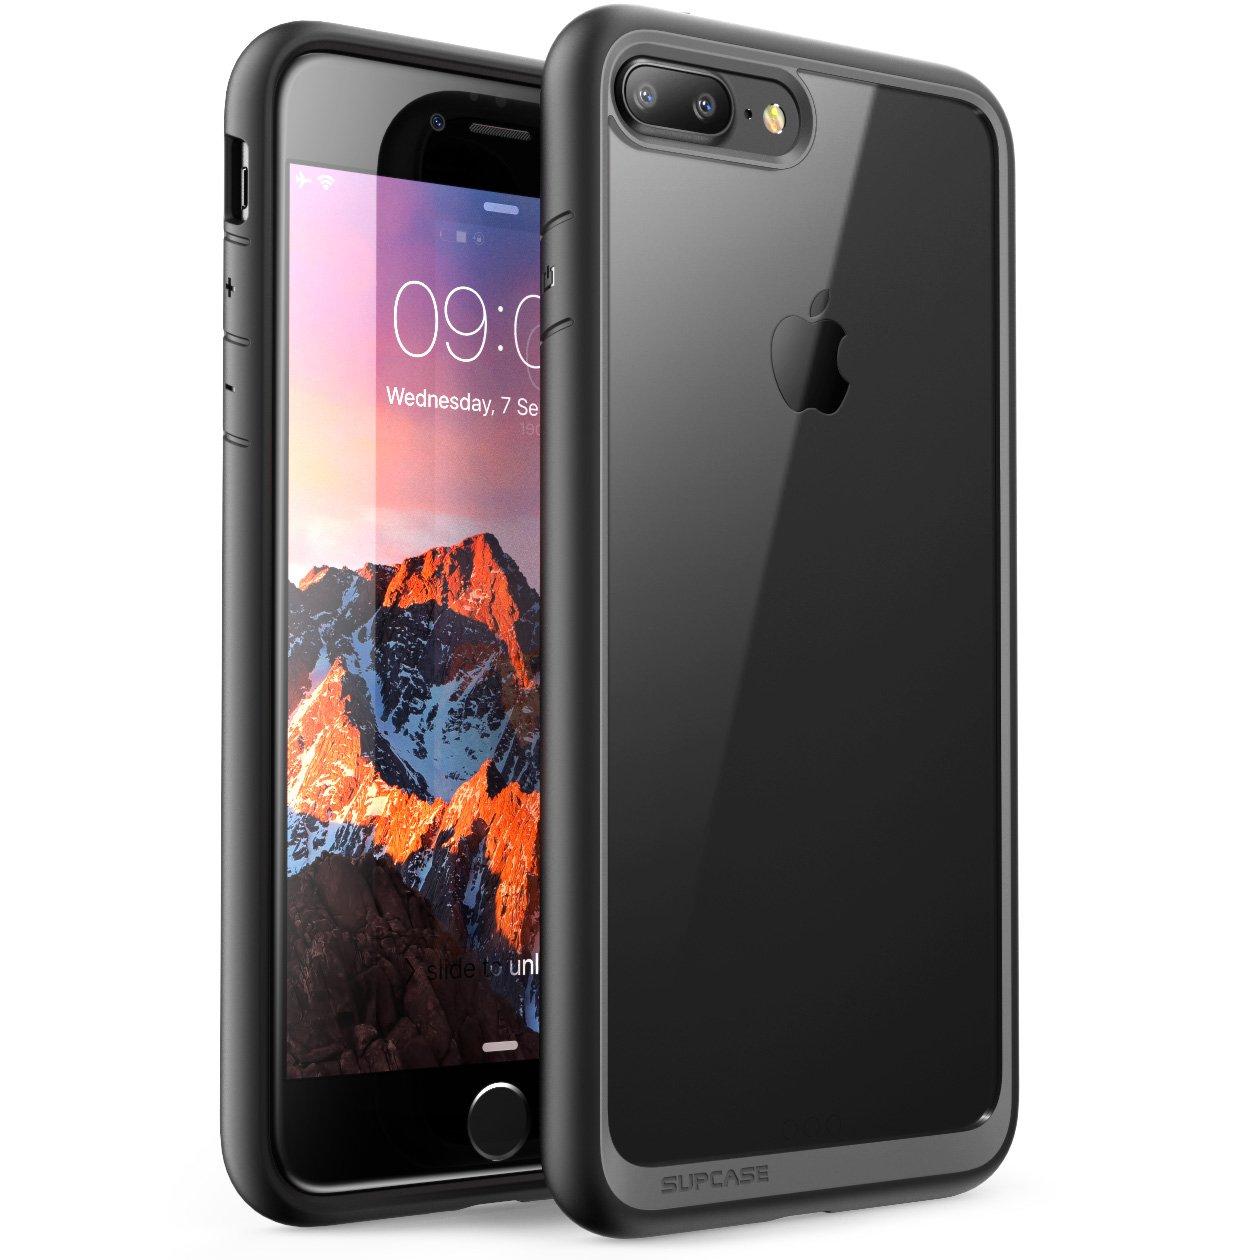 dc9da404d SUPCASE Unicorn Beetle Style Design for iPhone 8 Plus Case, Premium Hybrid  Protective Clear Bumper Case [Scratch Resistant] for Apple iPhone 7 Plus  2016 ...